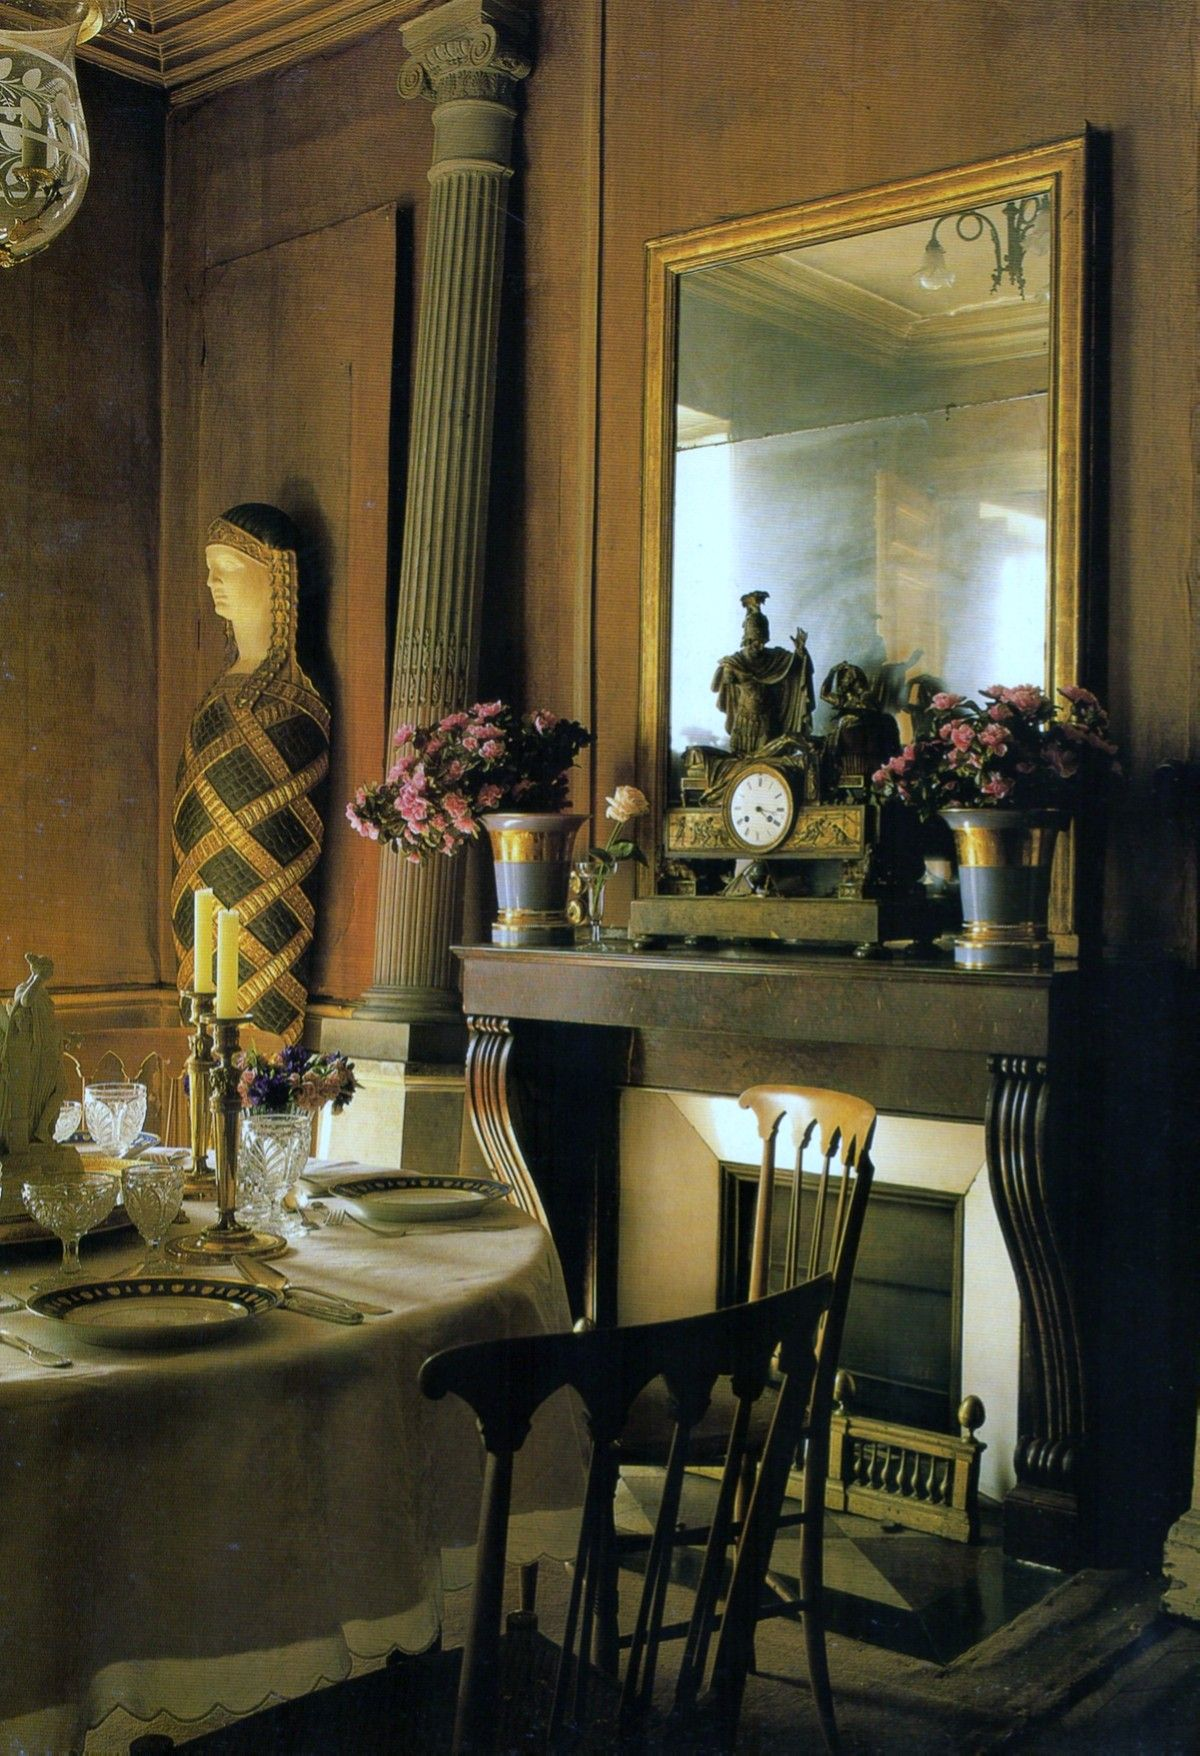 an egyptian mummy makes for an unusual dinner guest! ~splendor